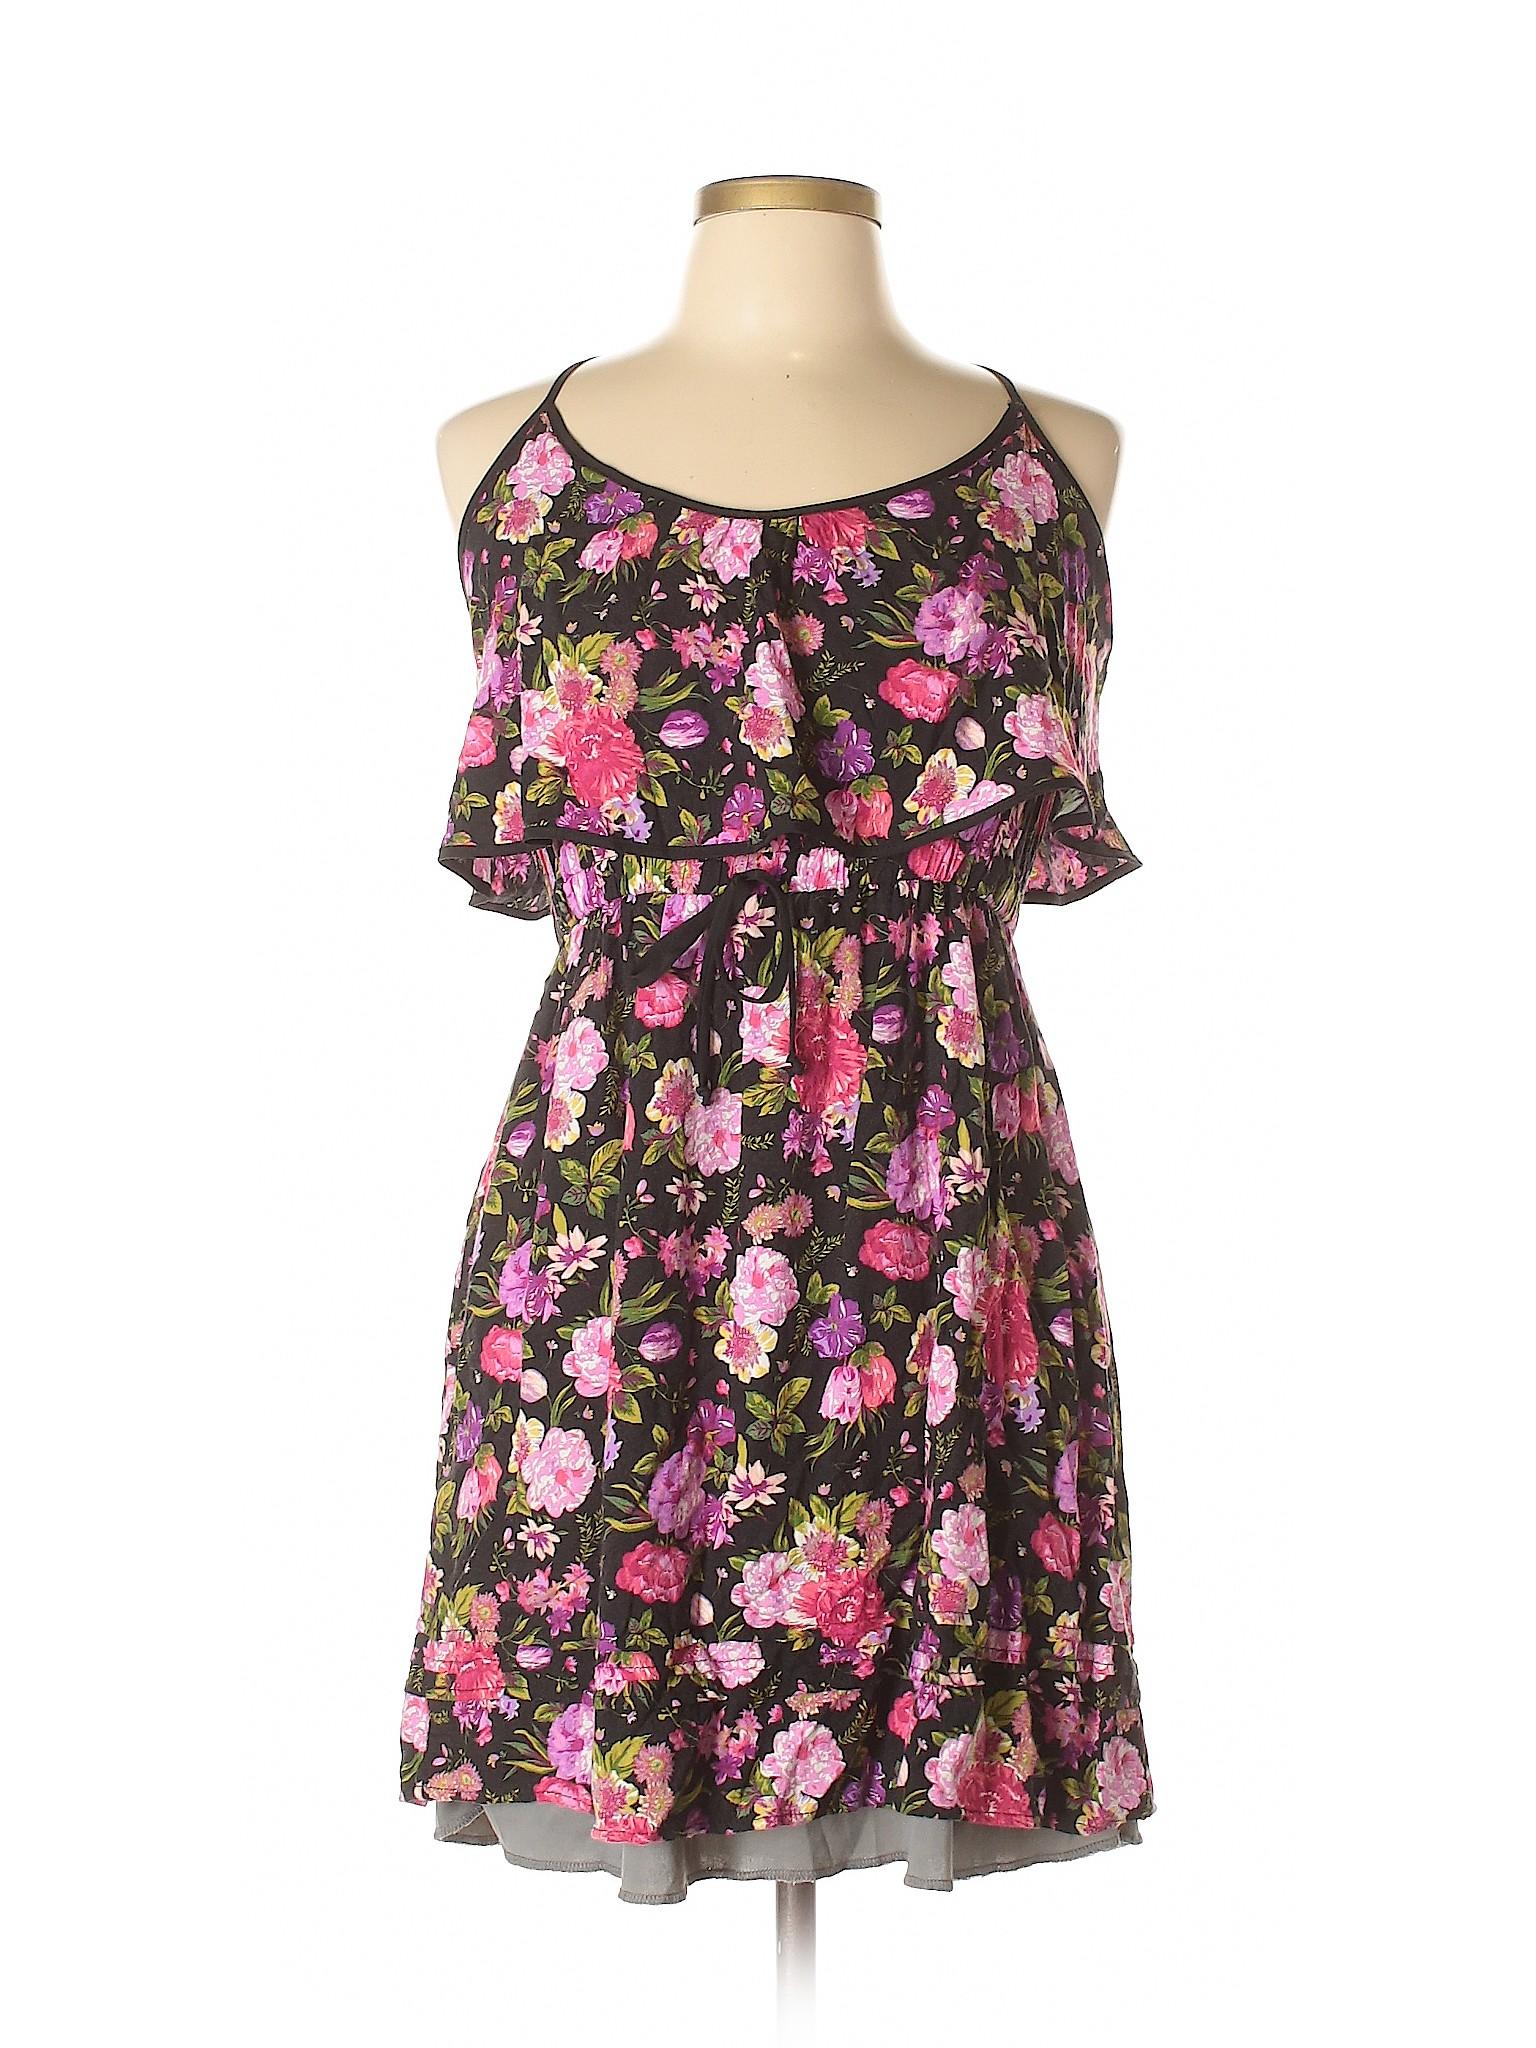 Casual Selling Chica Mimi Selling Casual Dress Chica Mimi CqxwTatdq